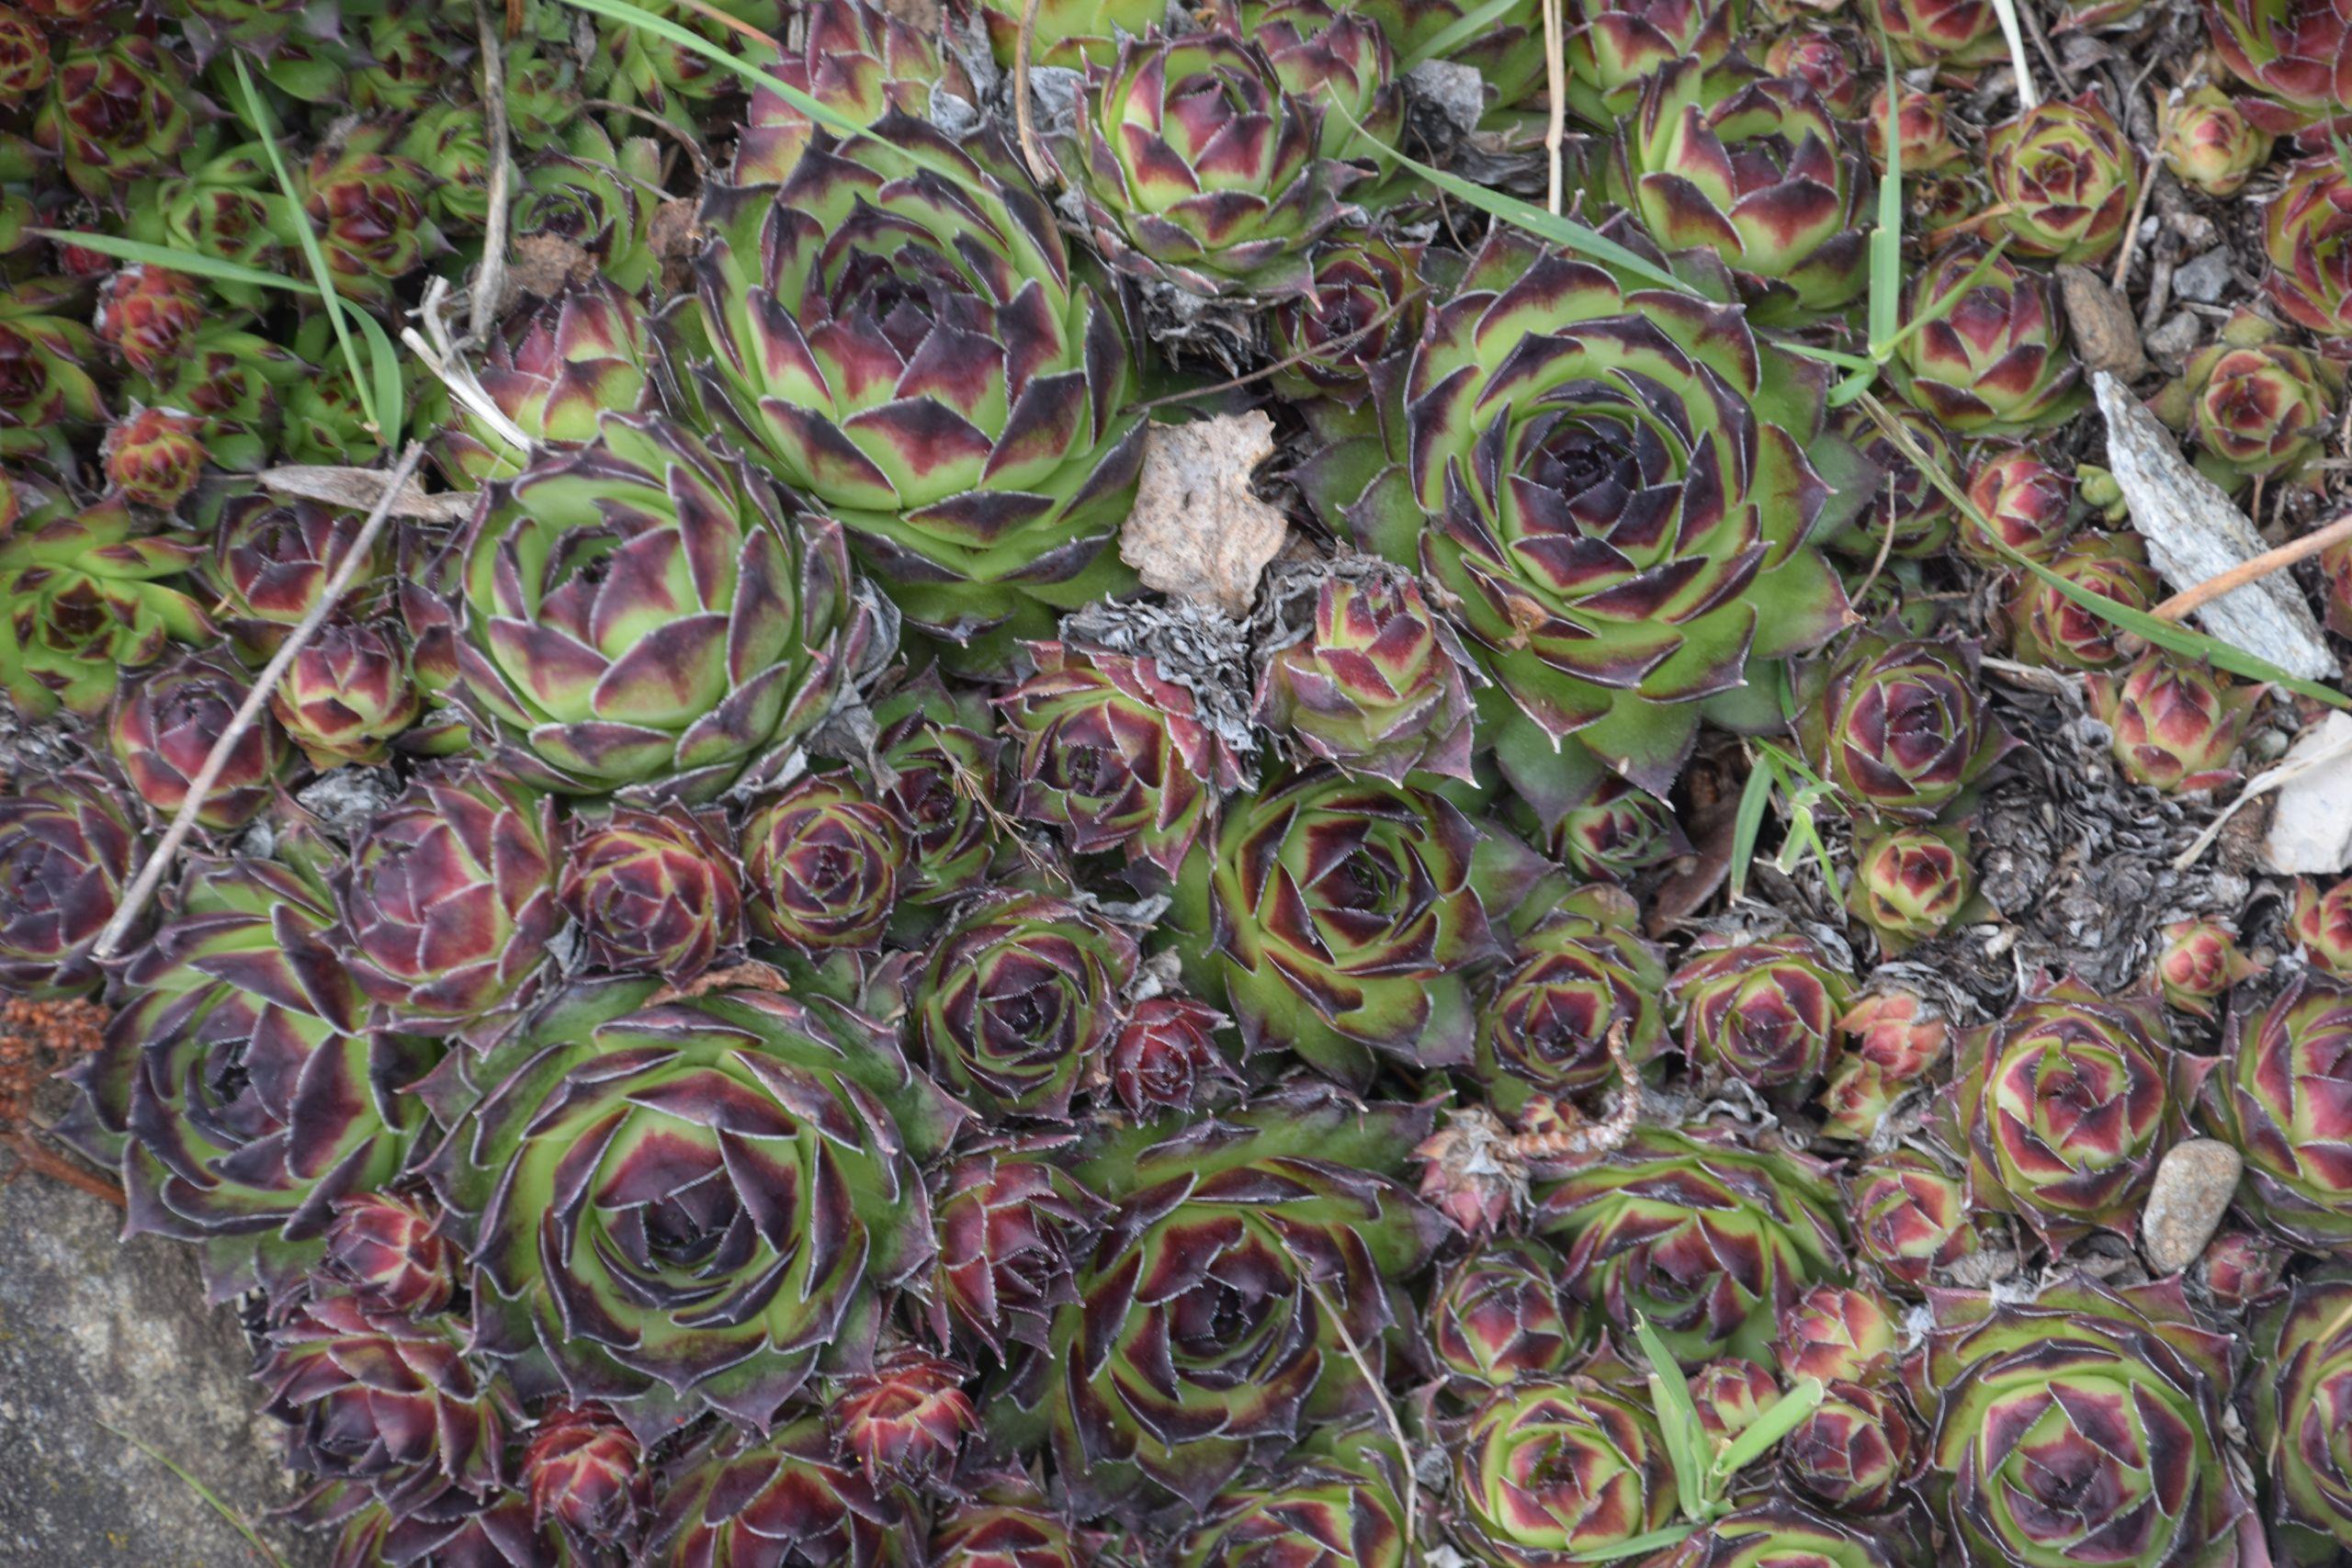 Jardin Botanique Luxe File Sempervivum Tectorum In Jardin Botanique De L Aubrac 02